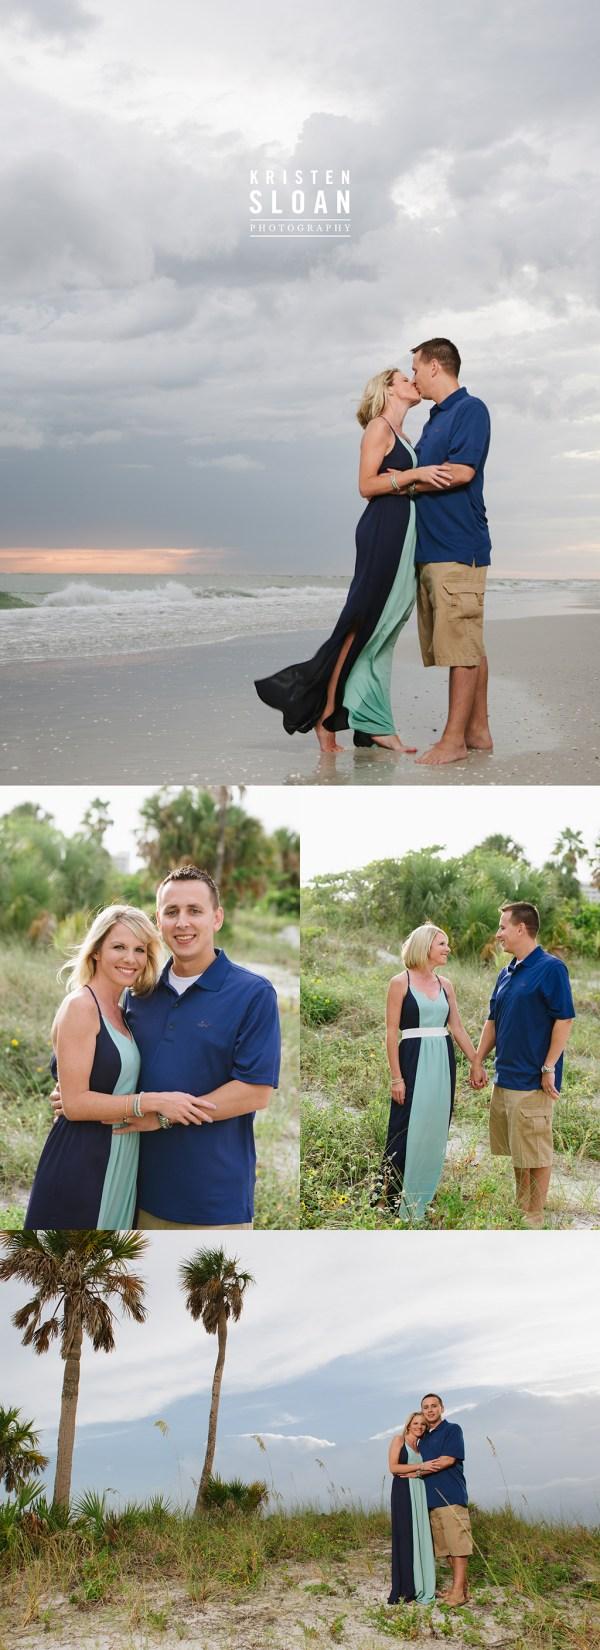 St Pete Beach Treasure Island Family Beach Photos at Sunset | Treasure Island Wedding Portrait Photographer | St Pete Beach Wedding Portrait Photographer Kristen Sloan